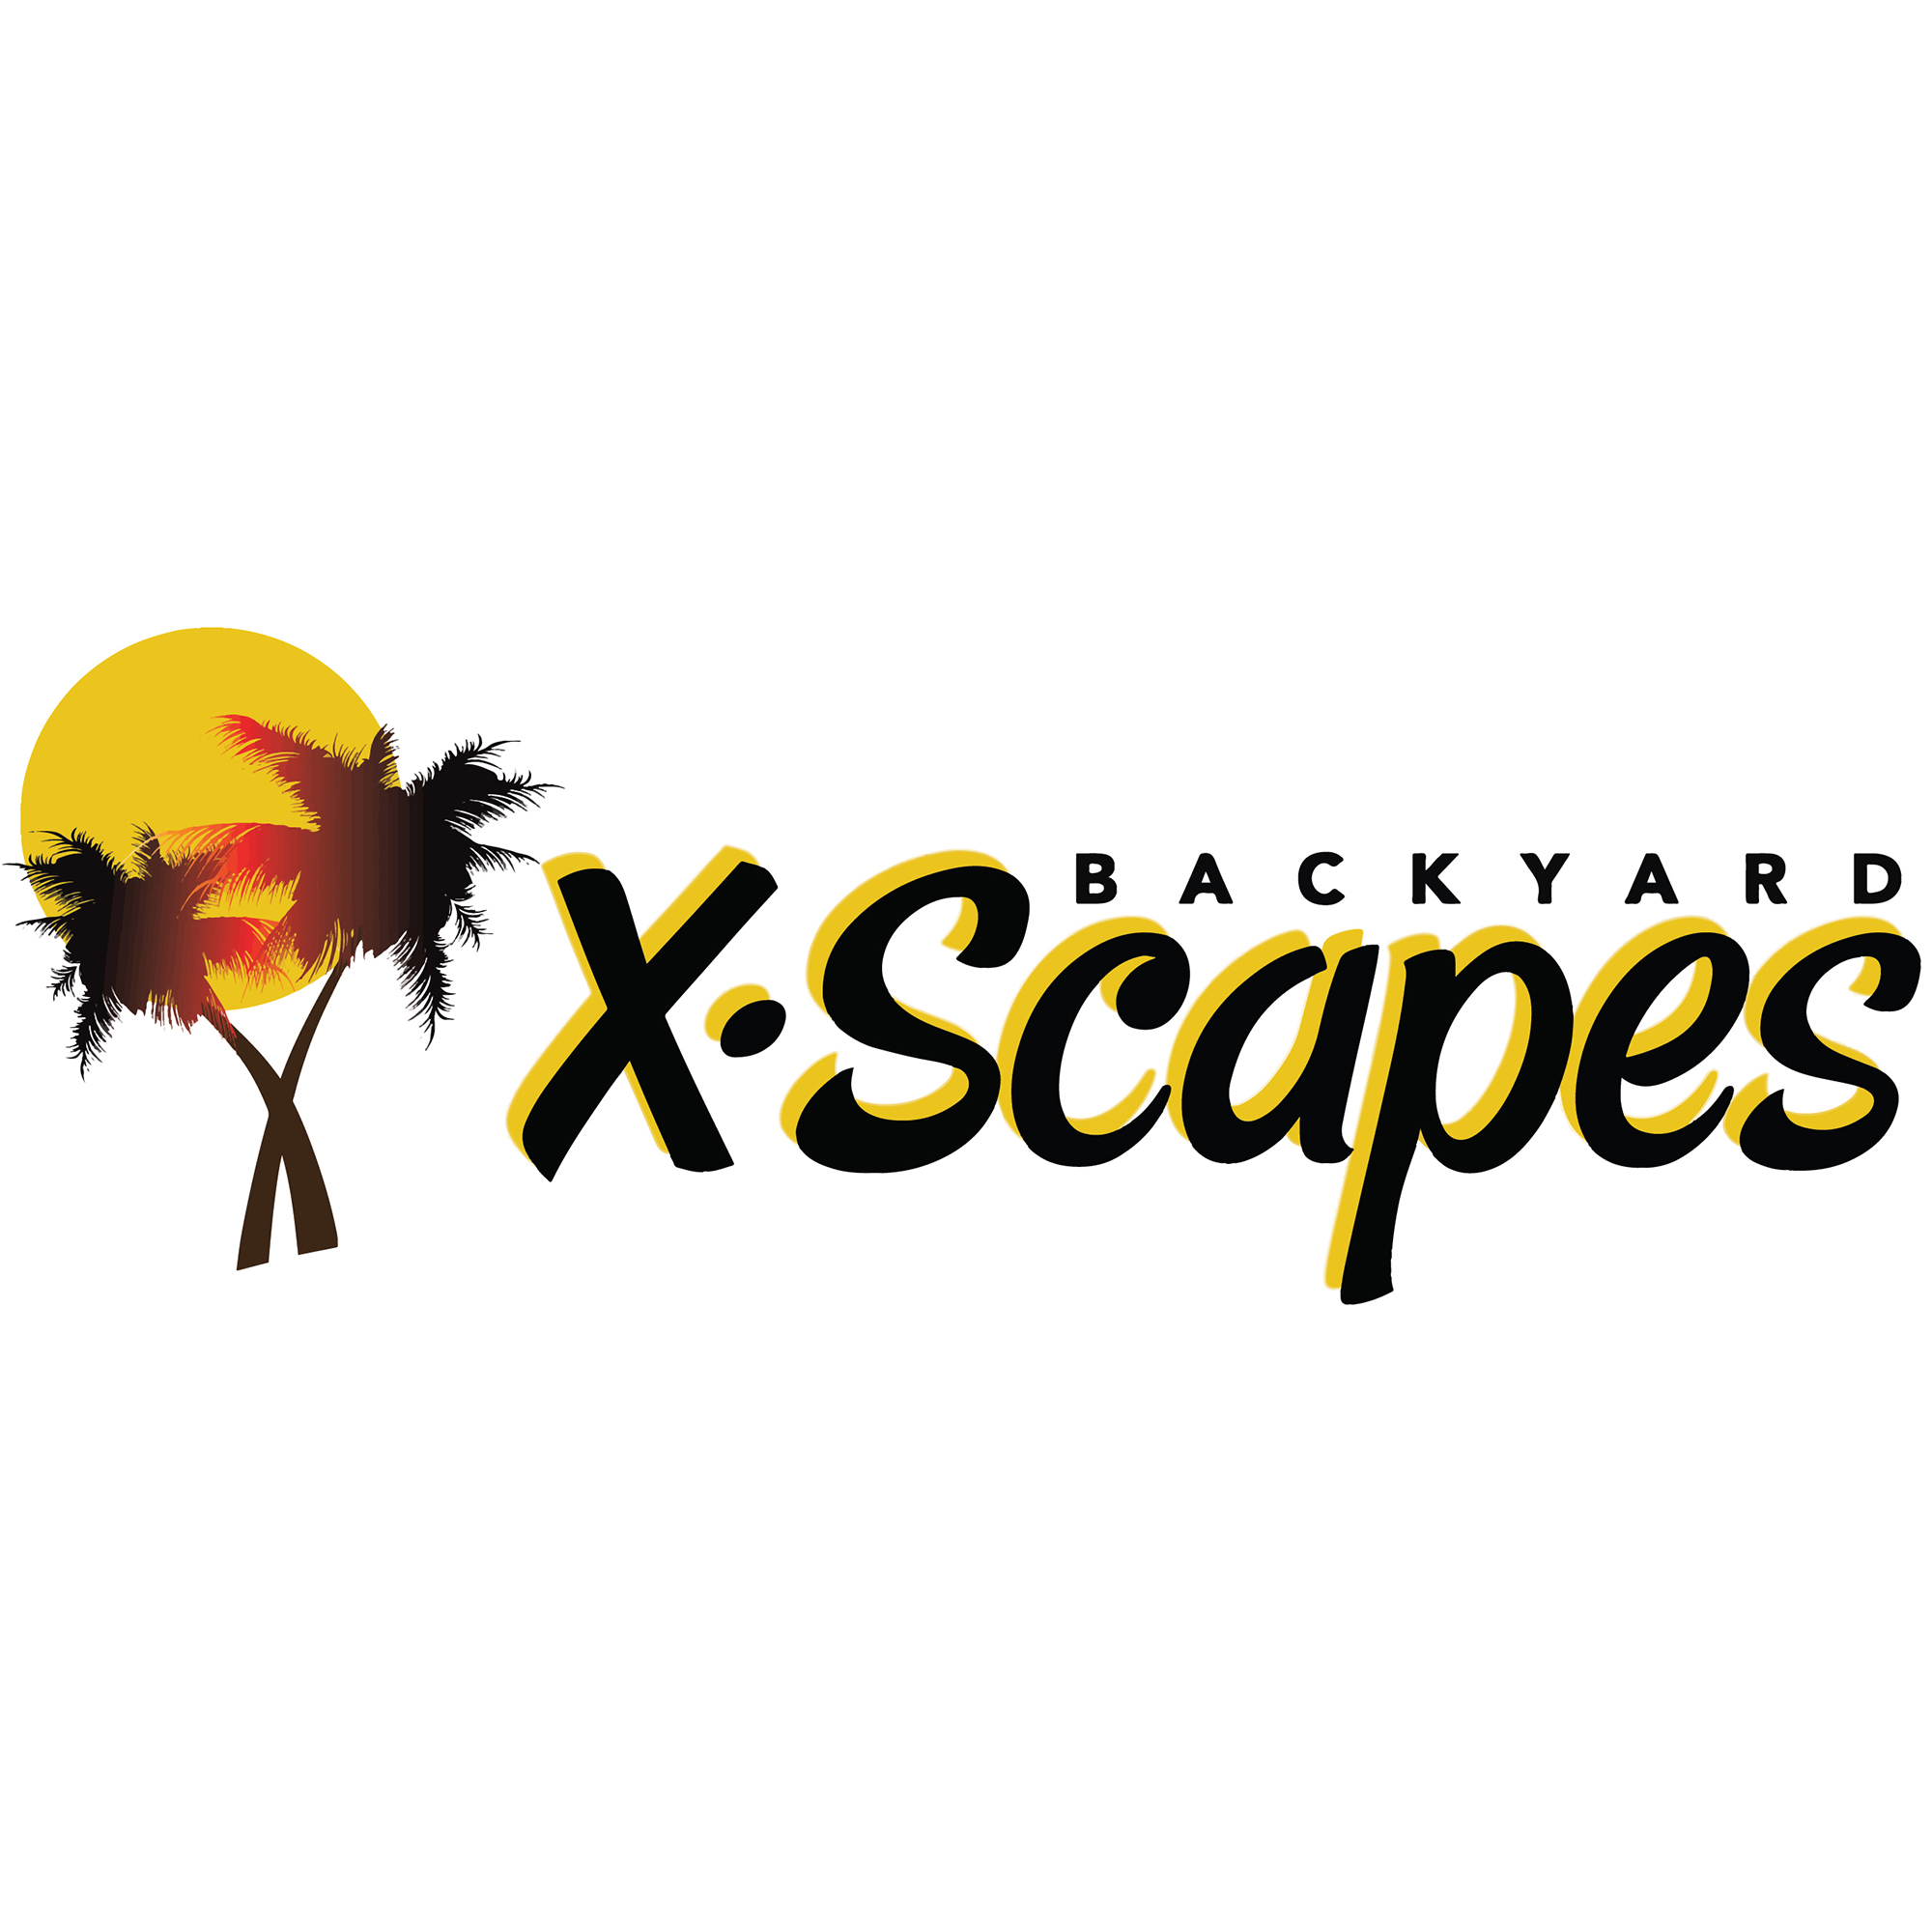 XSCAPES_HI-Square.jpg